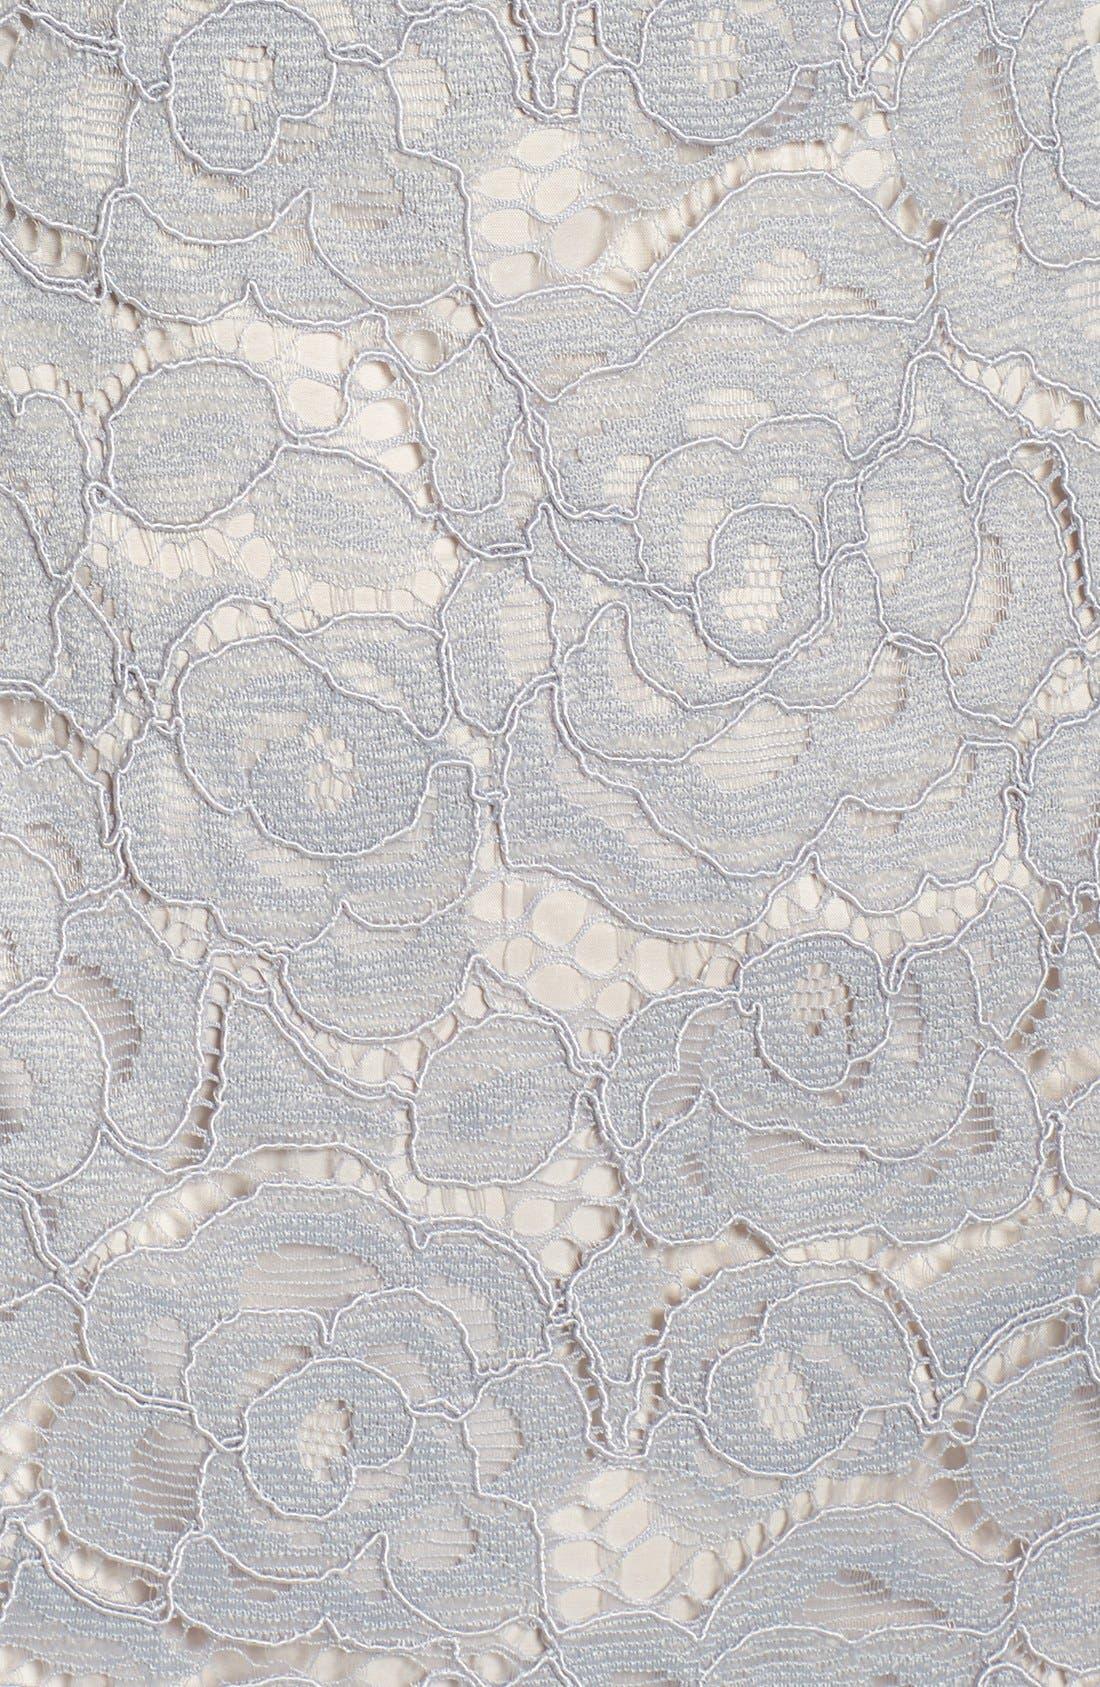 Off the Shoulder Lace Sheath Dress,                             Alternate thumbnail 37, color,